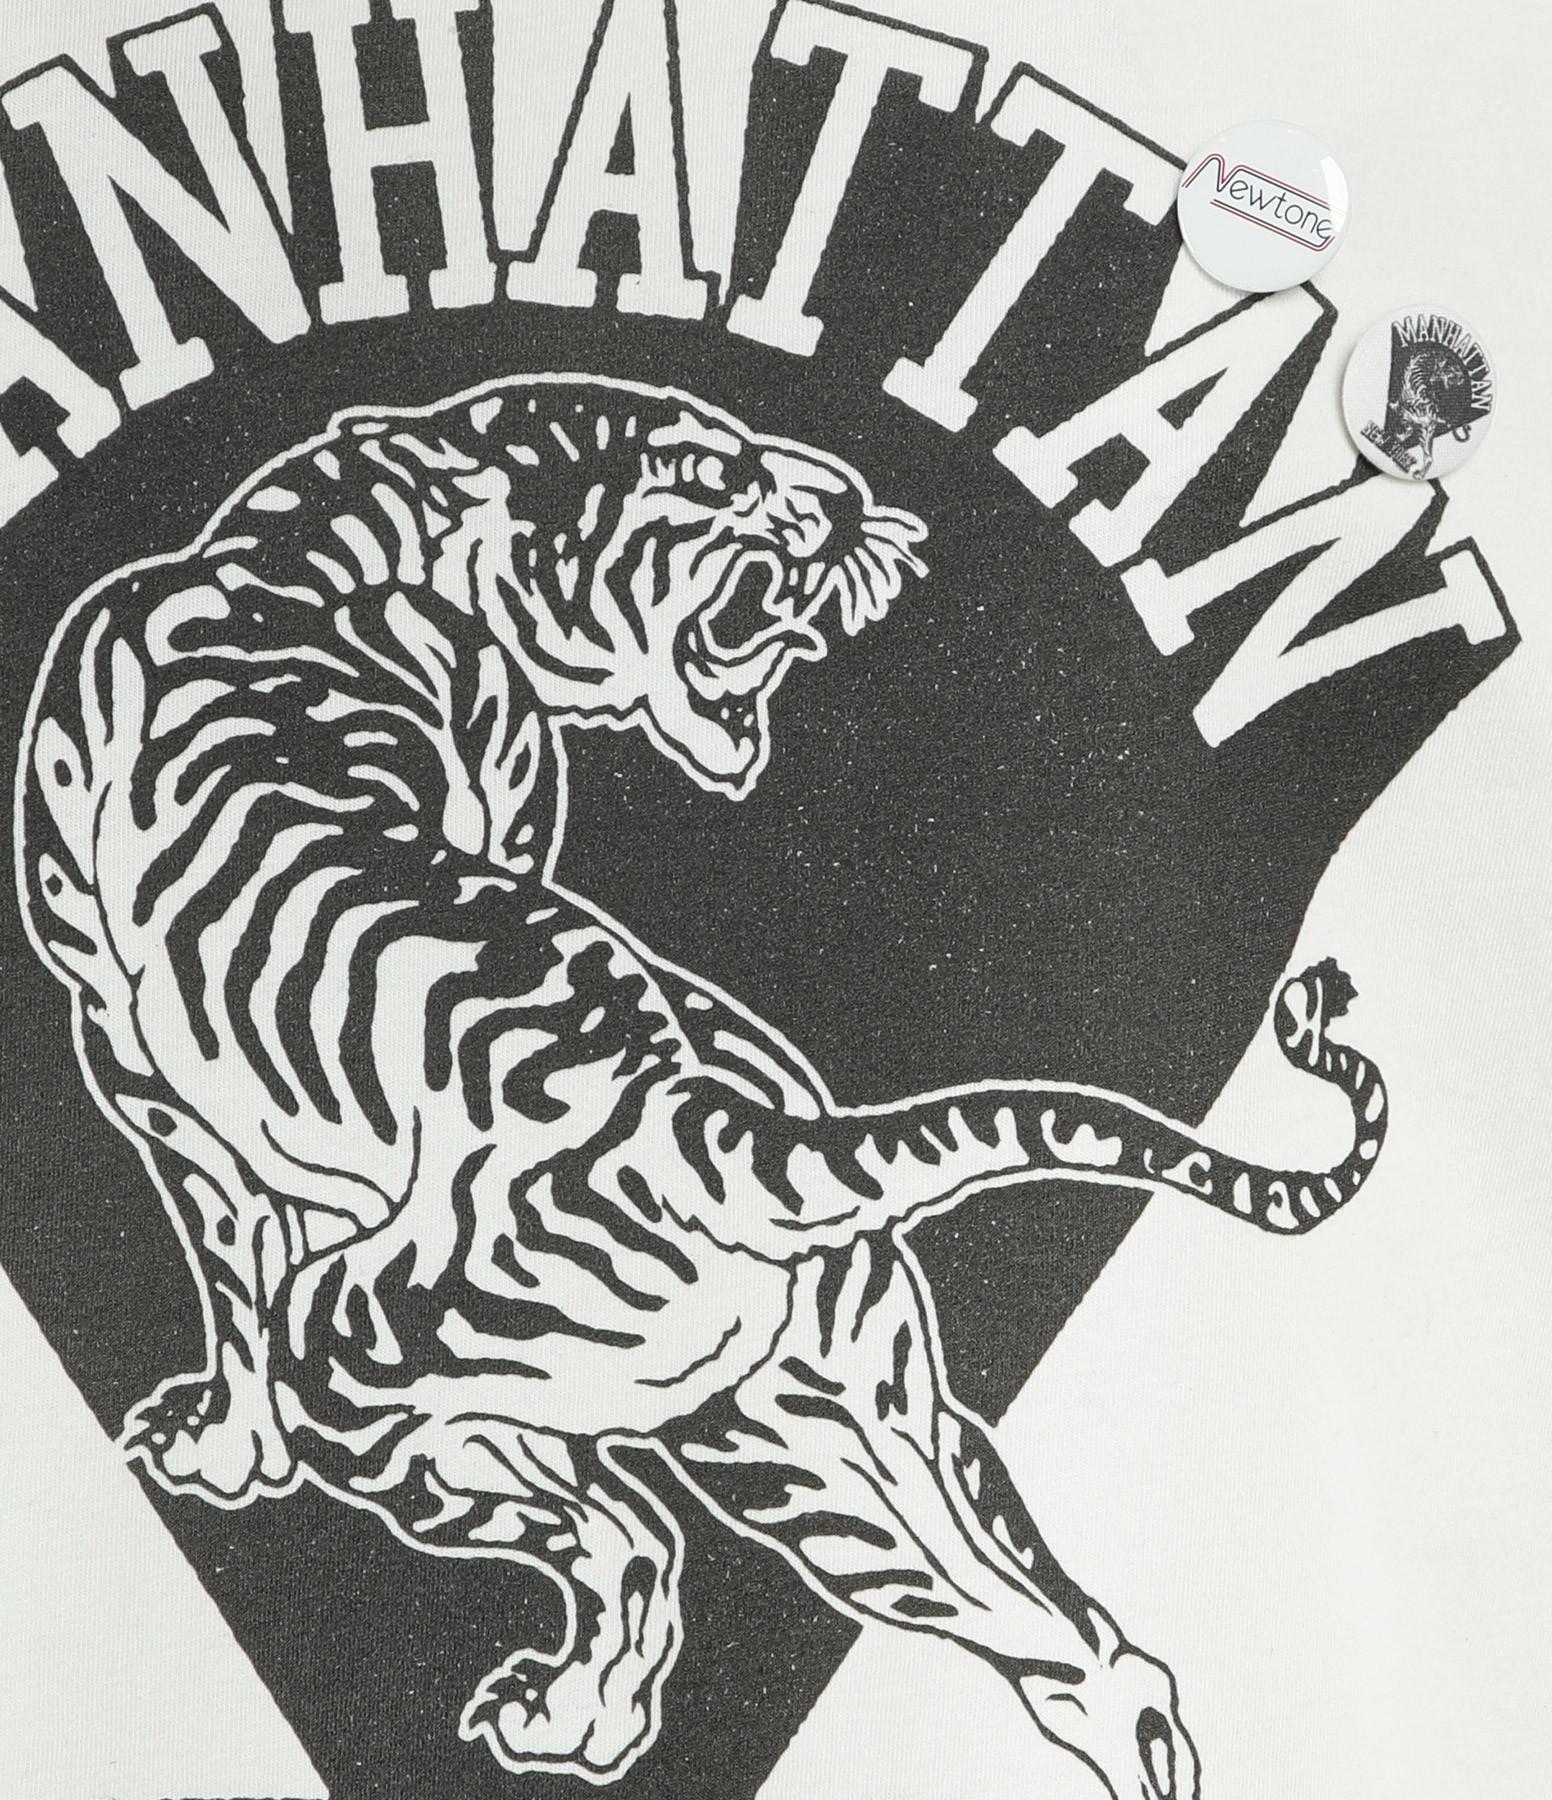 NEWTONE - Tee-shirt Biker Manhattan Coton Blanc